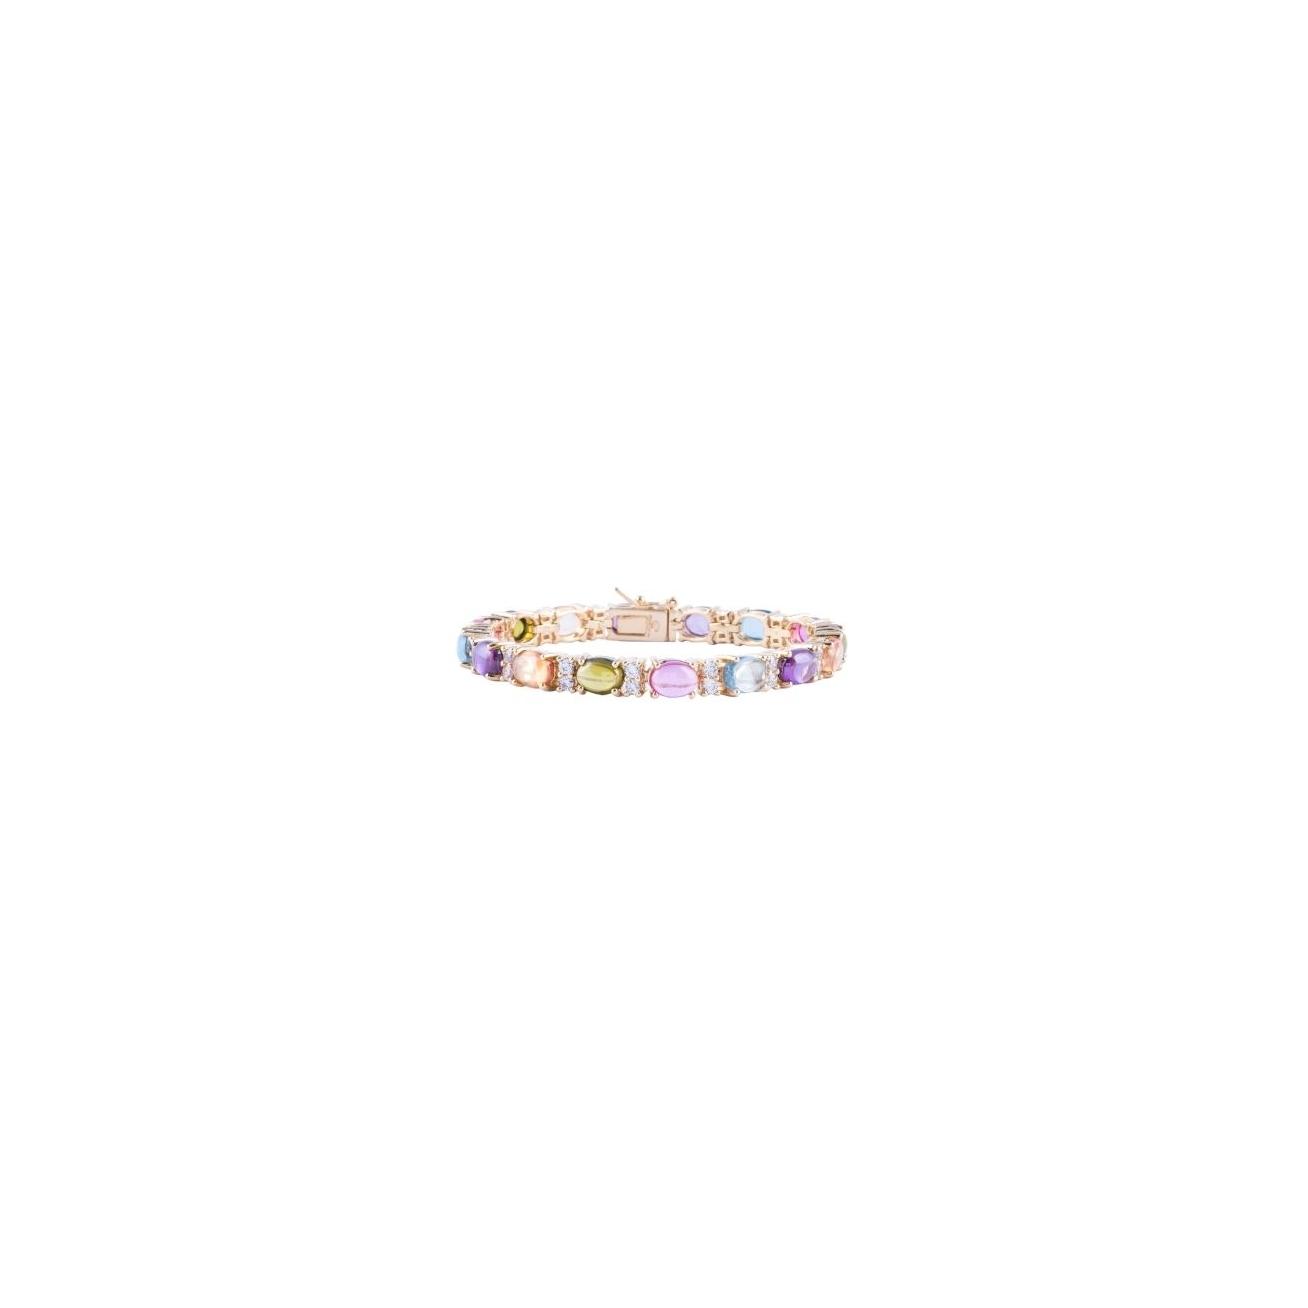 Multicolor oval cabochon plated tennis bracelet